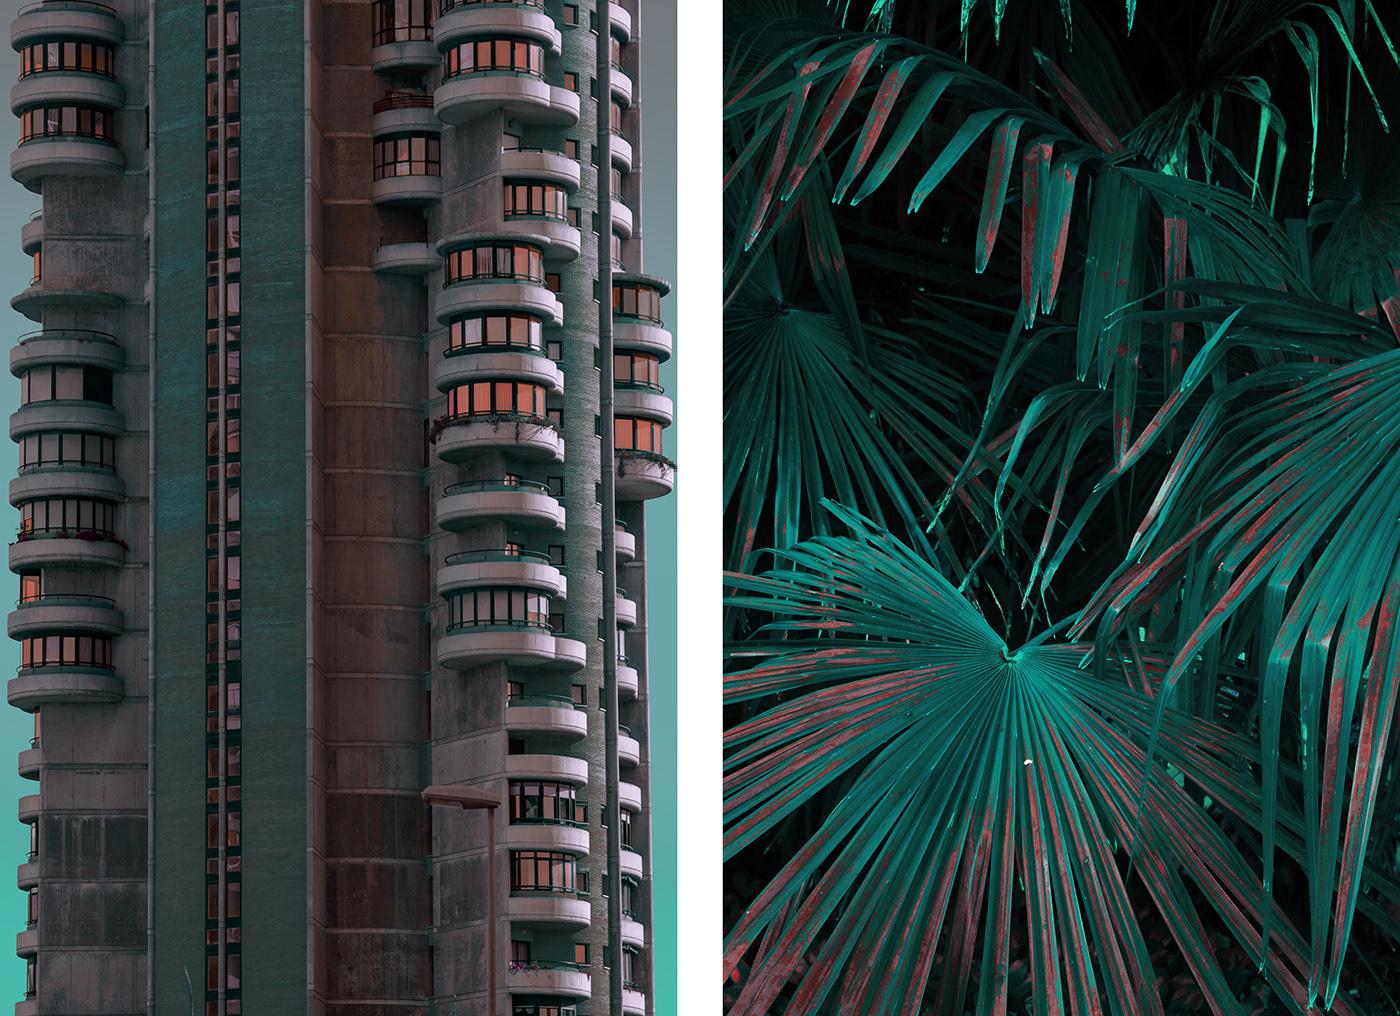 minimal Minimalism color Landscape diptych art photography surreal symbolism architecture Nature